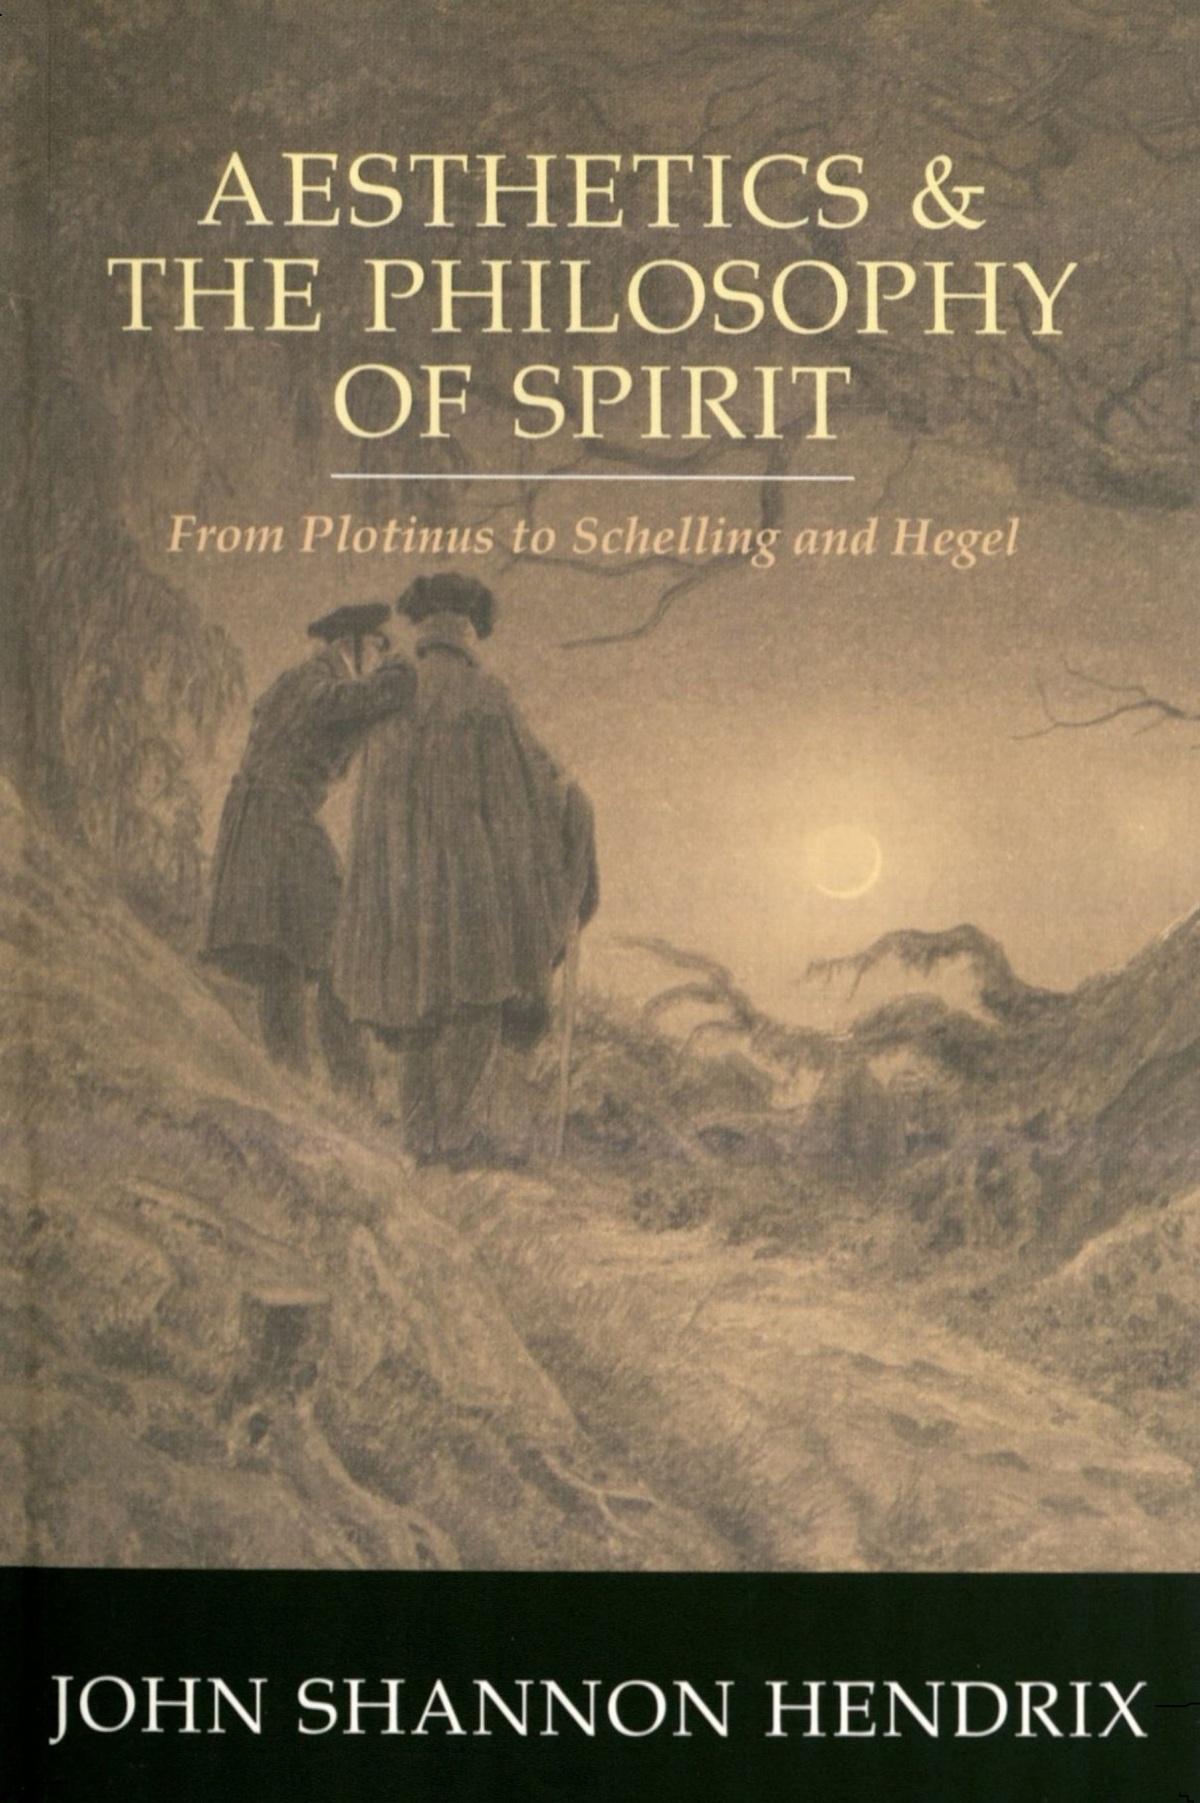 Aesthetics and the Philosophy of Spirit